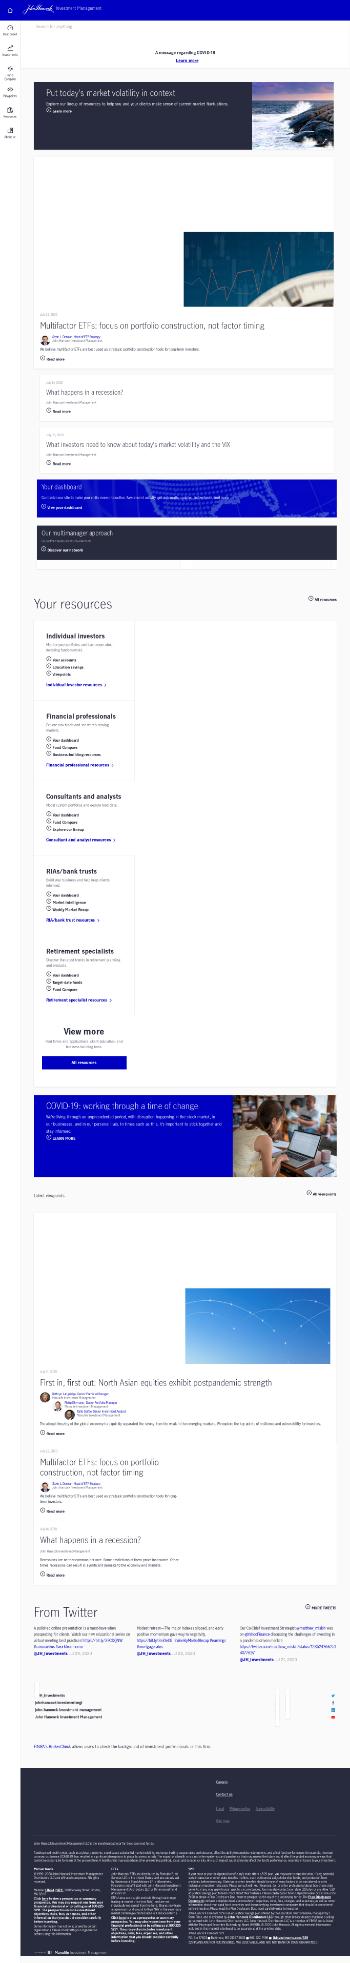 John Hancock Preferred Income Fund Website Screenshot